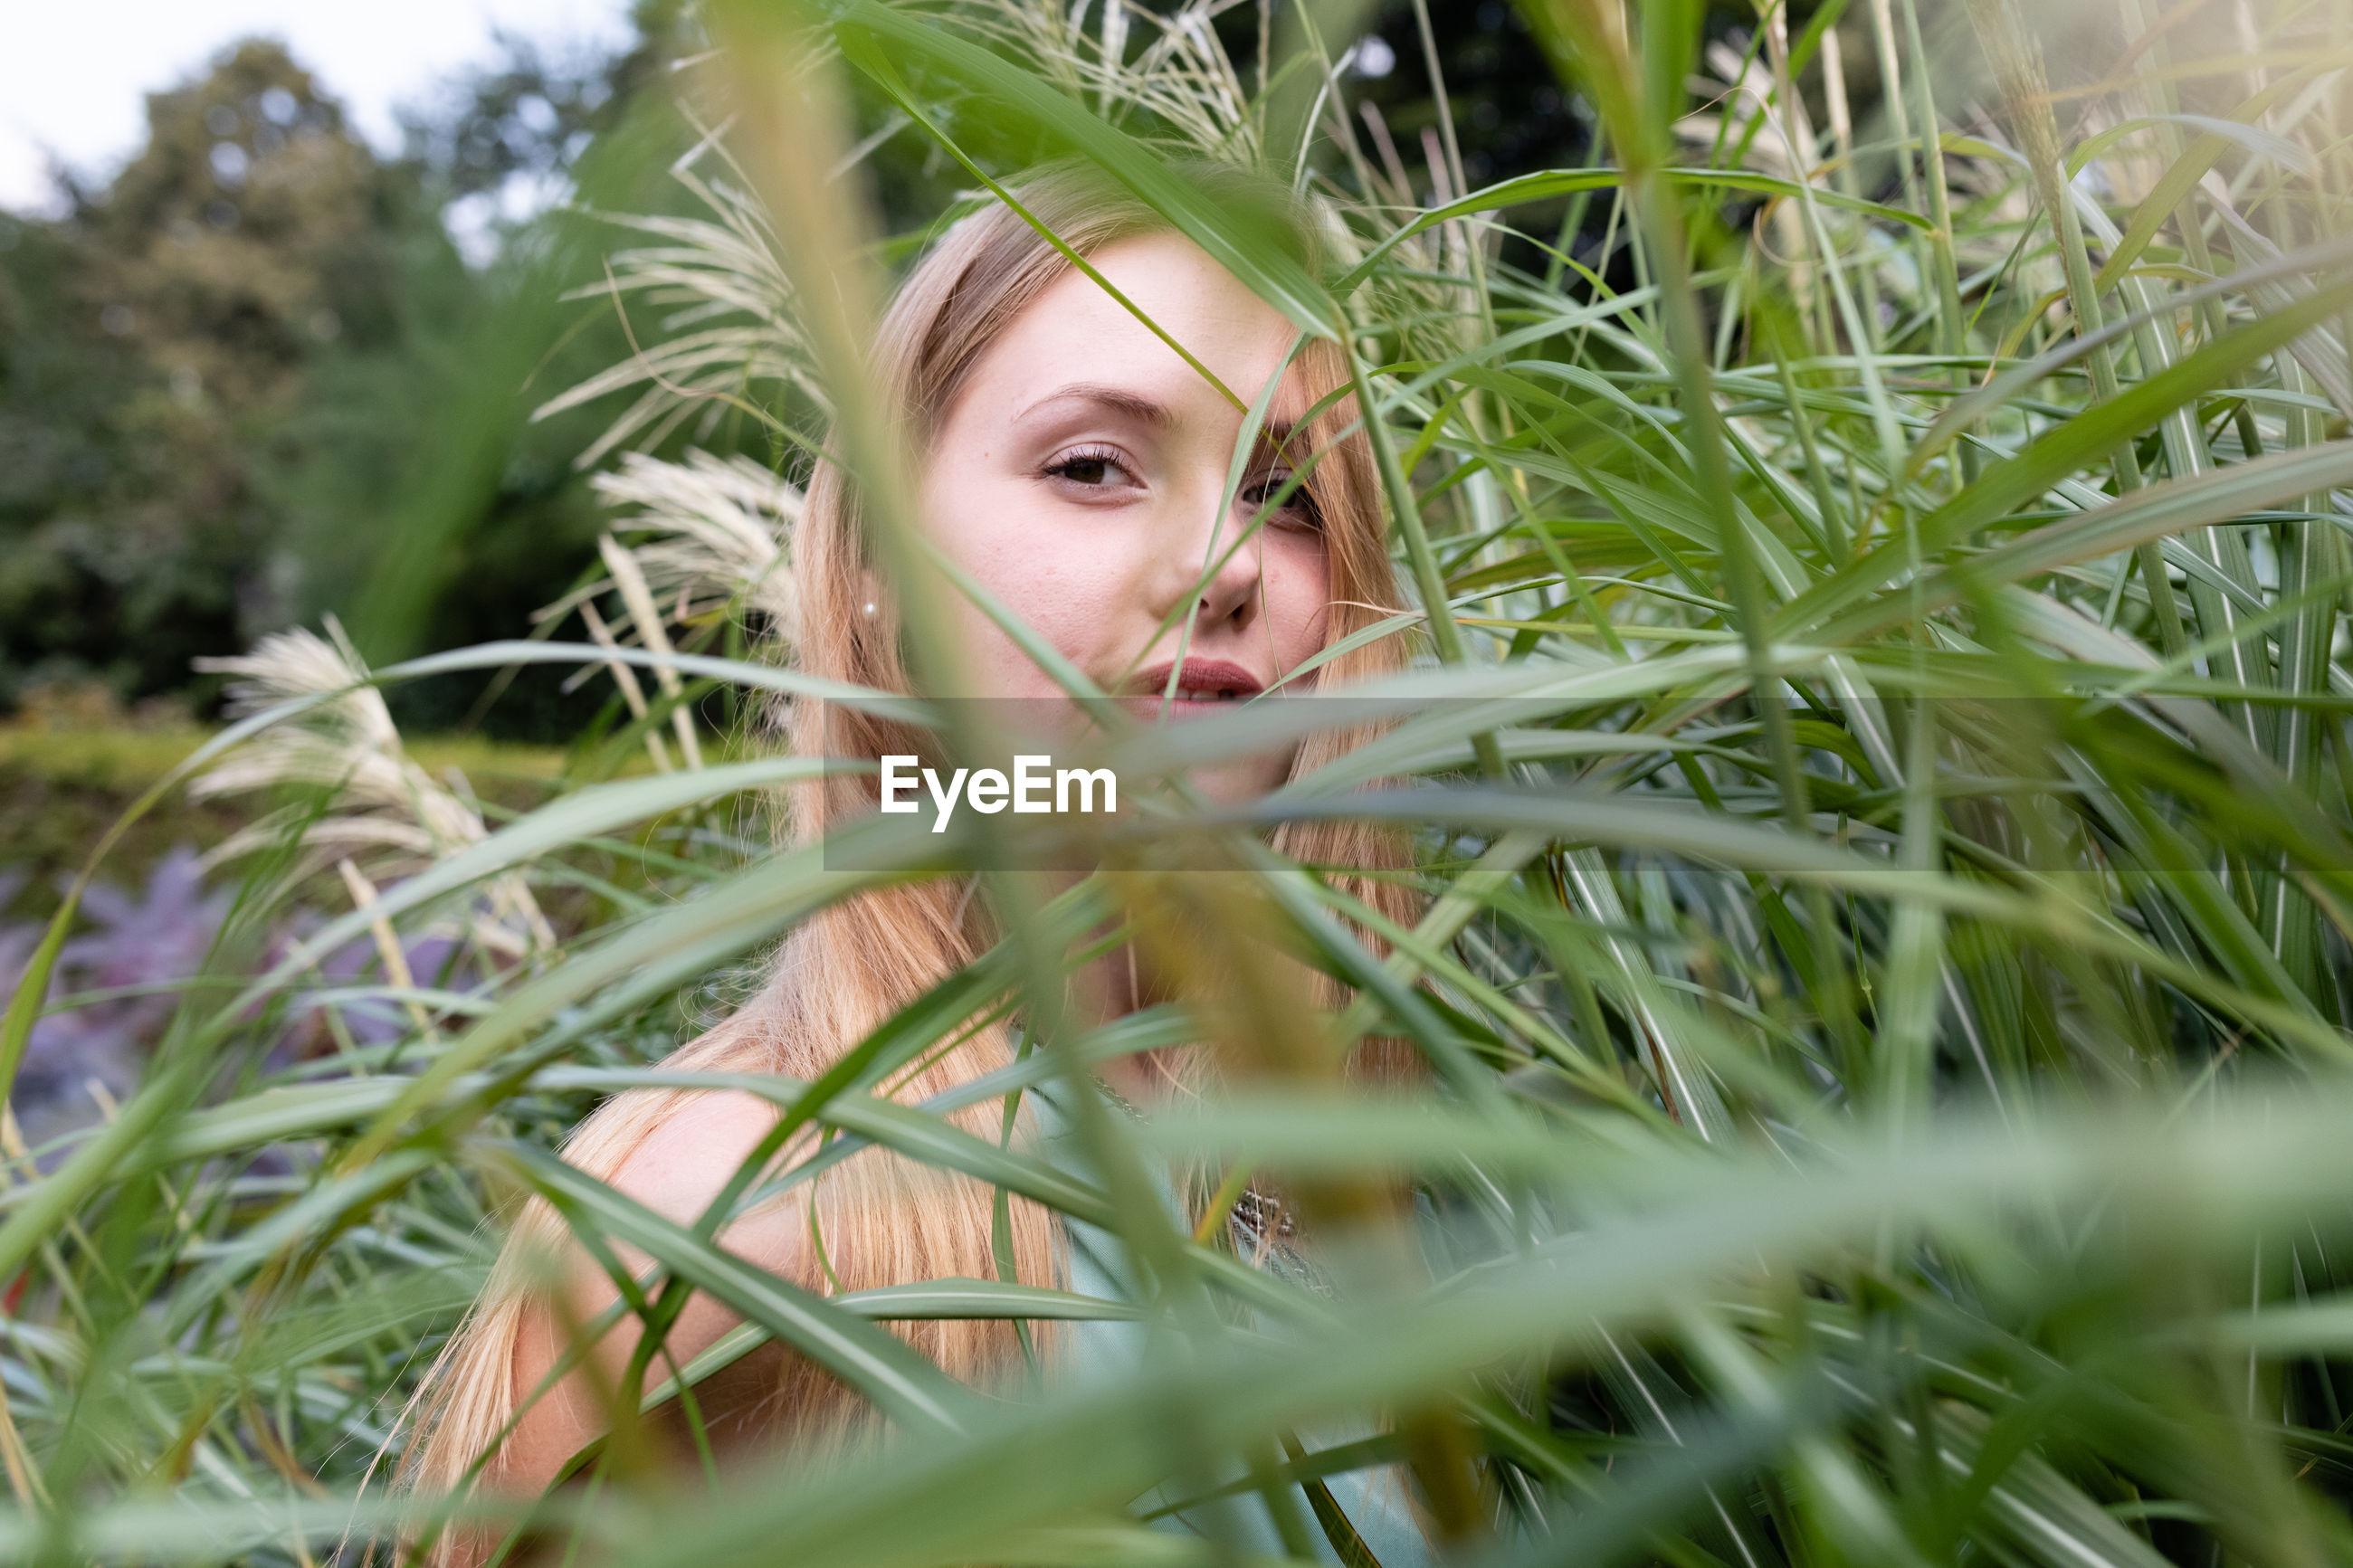 Portrait of woman standing amidst plants